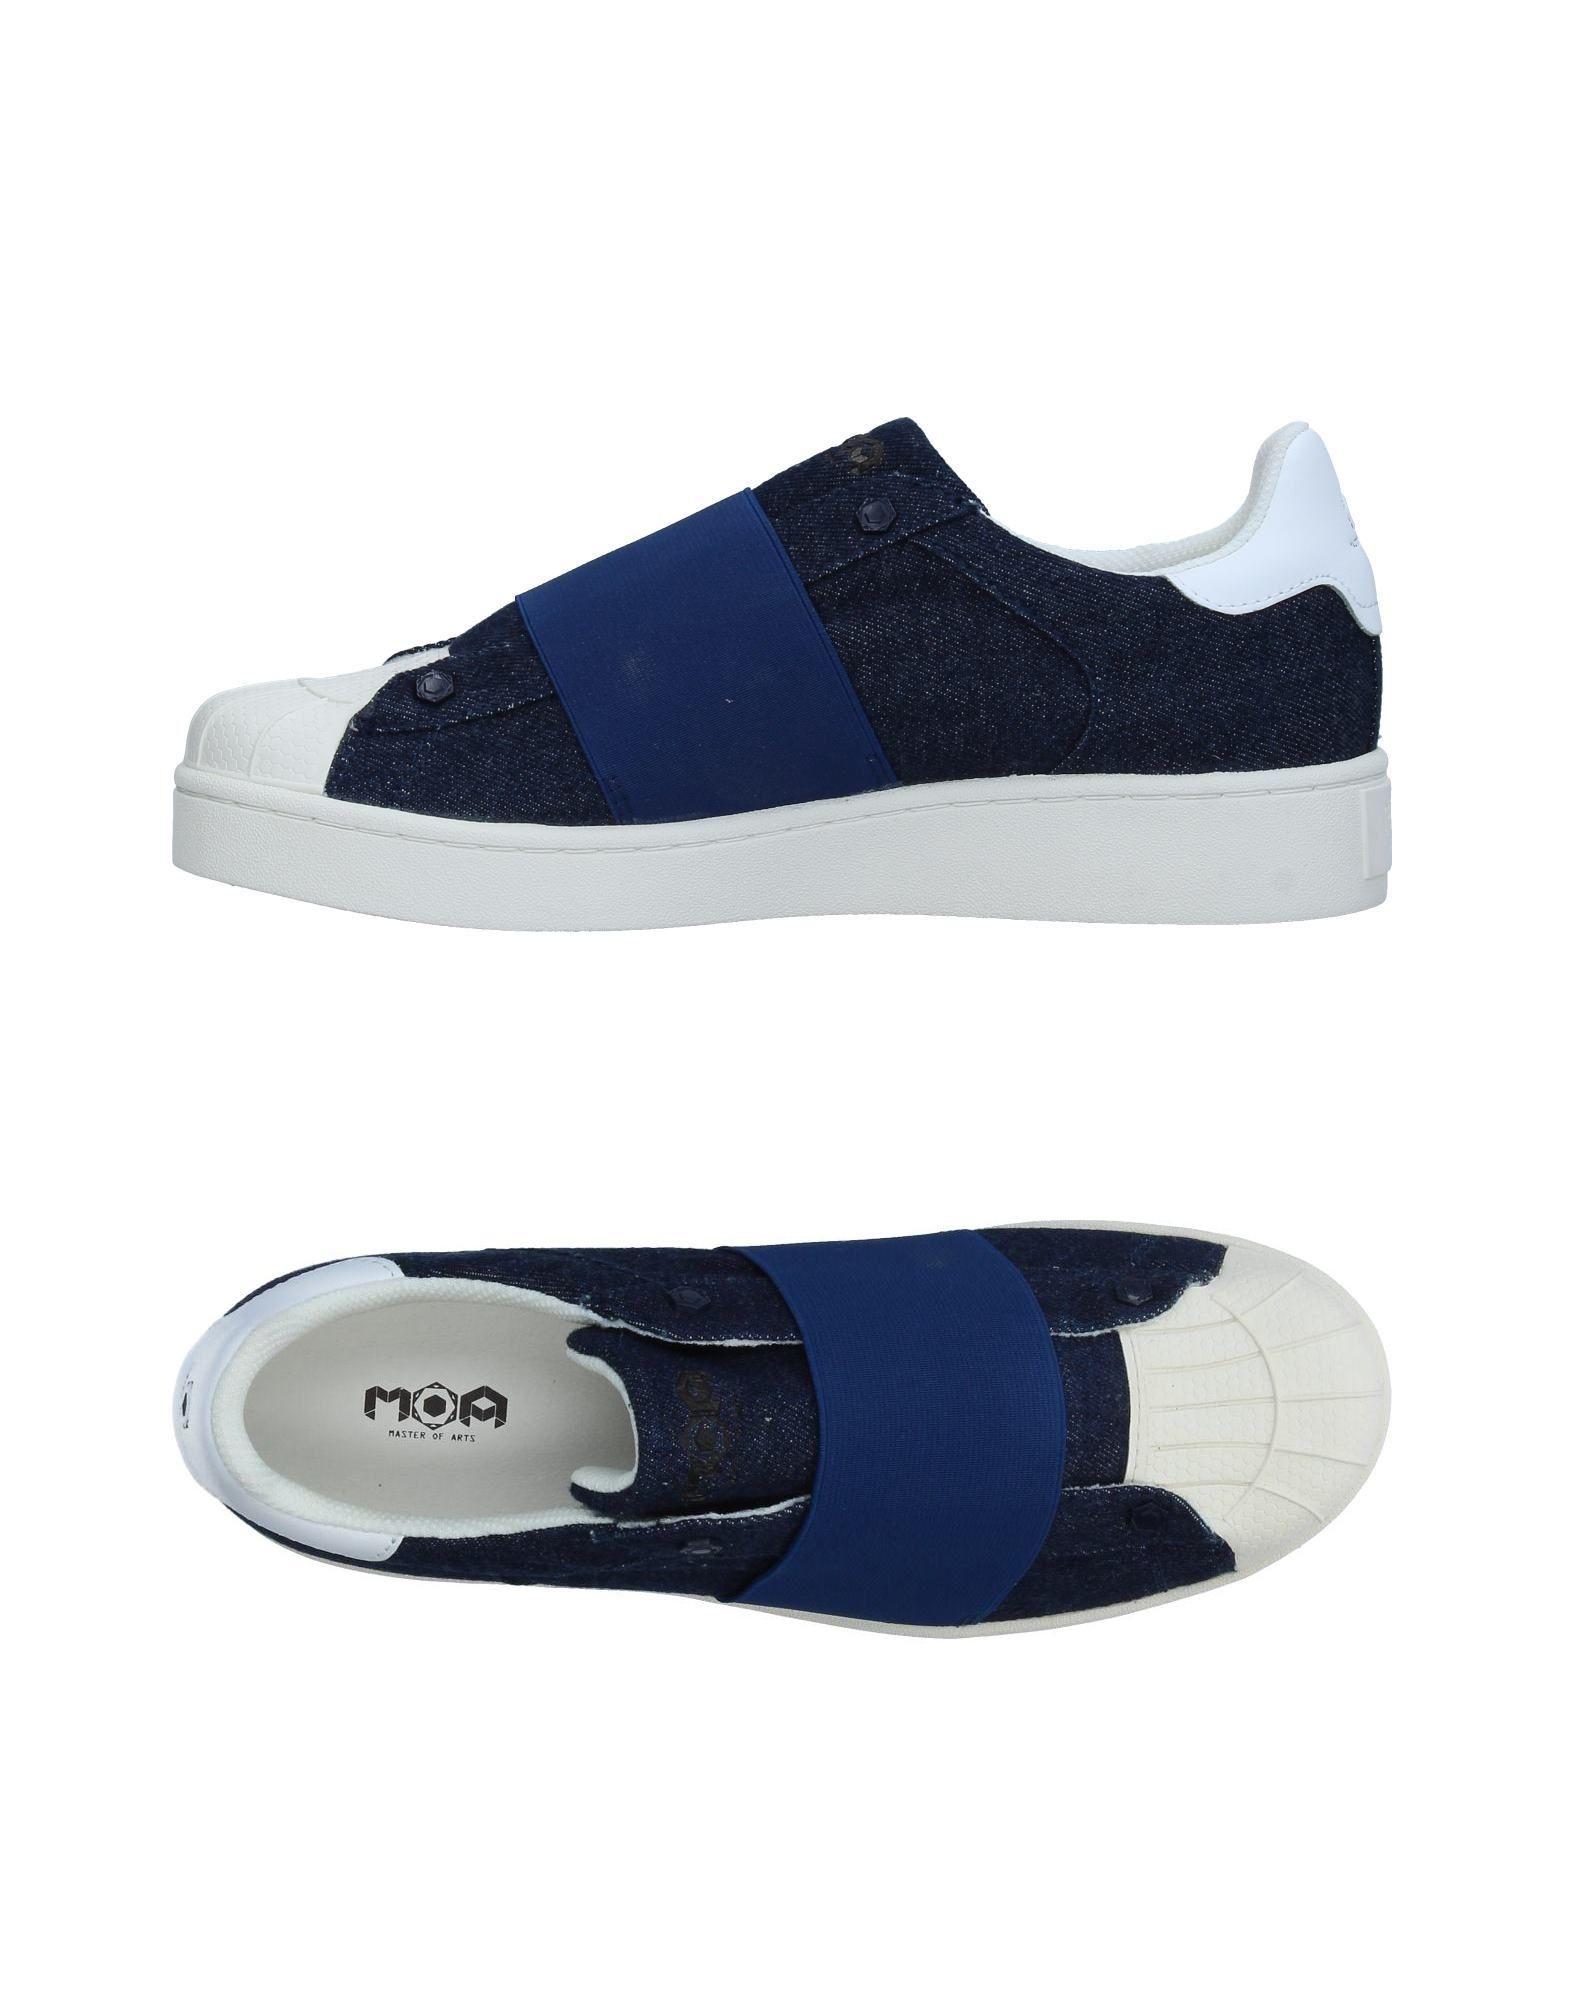 Rabatt echte Schuhe Moa Master Master Master Of Arts Sneakers Herren  11333530SP aec9cb